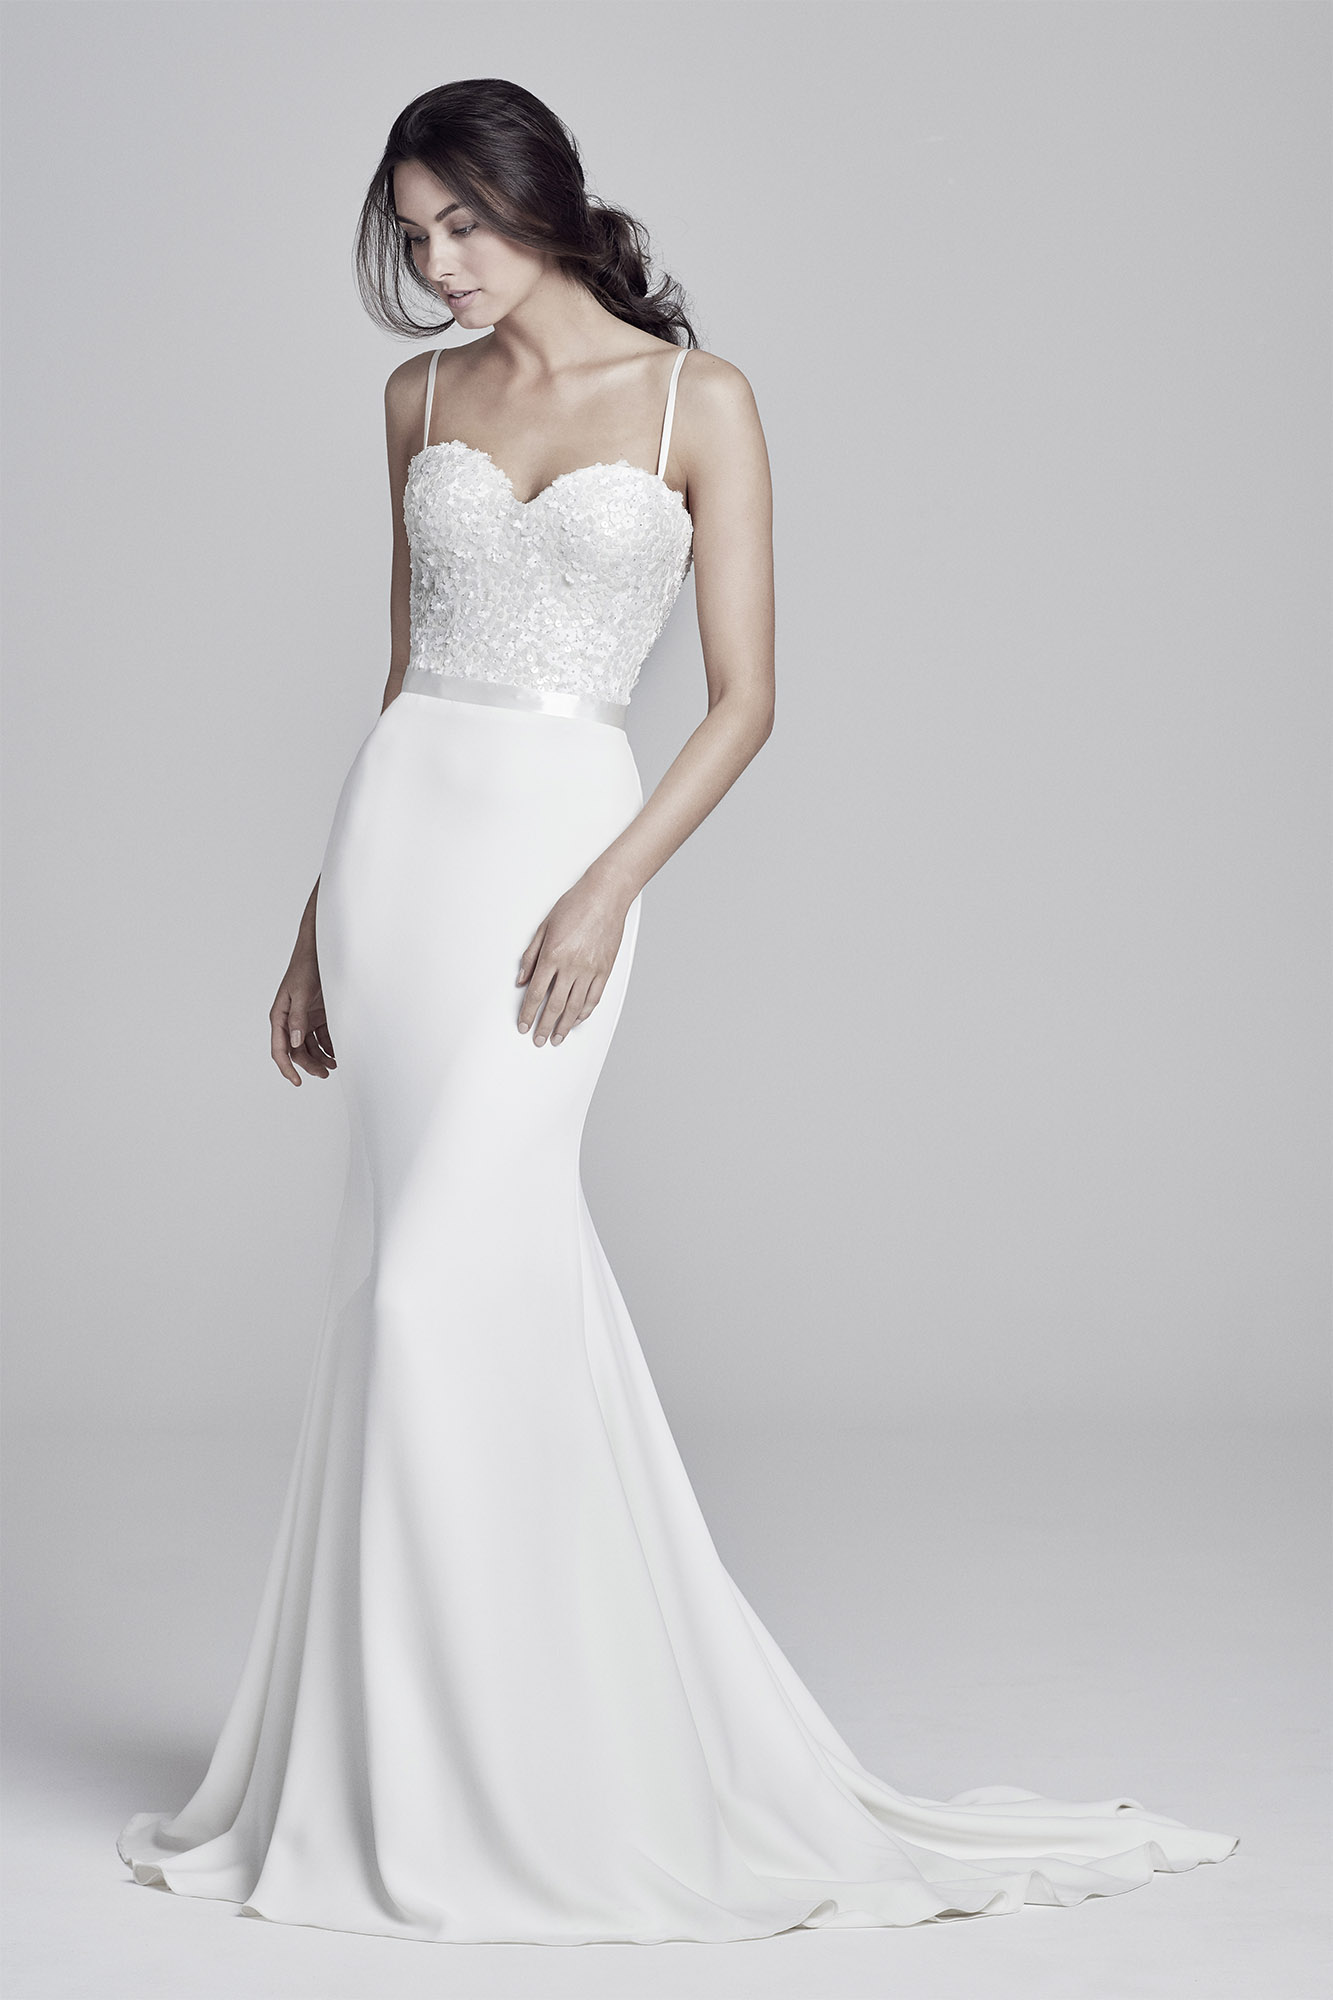 Bronte   Lookbook Collection 2019   designer wedding dresses by Suzanne Neville